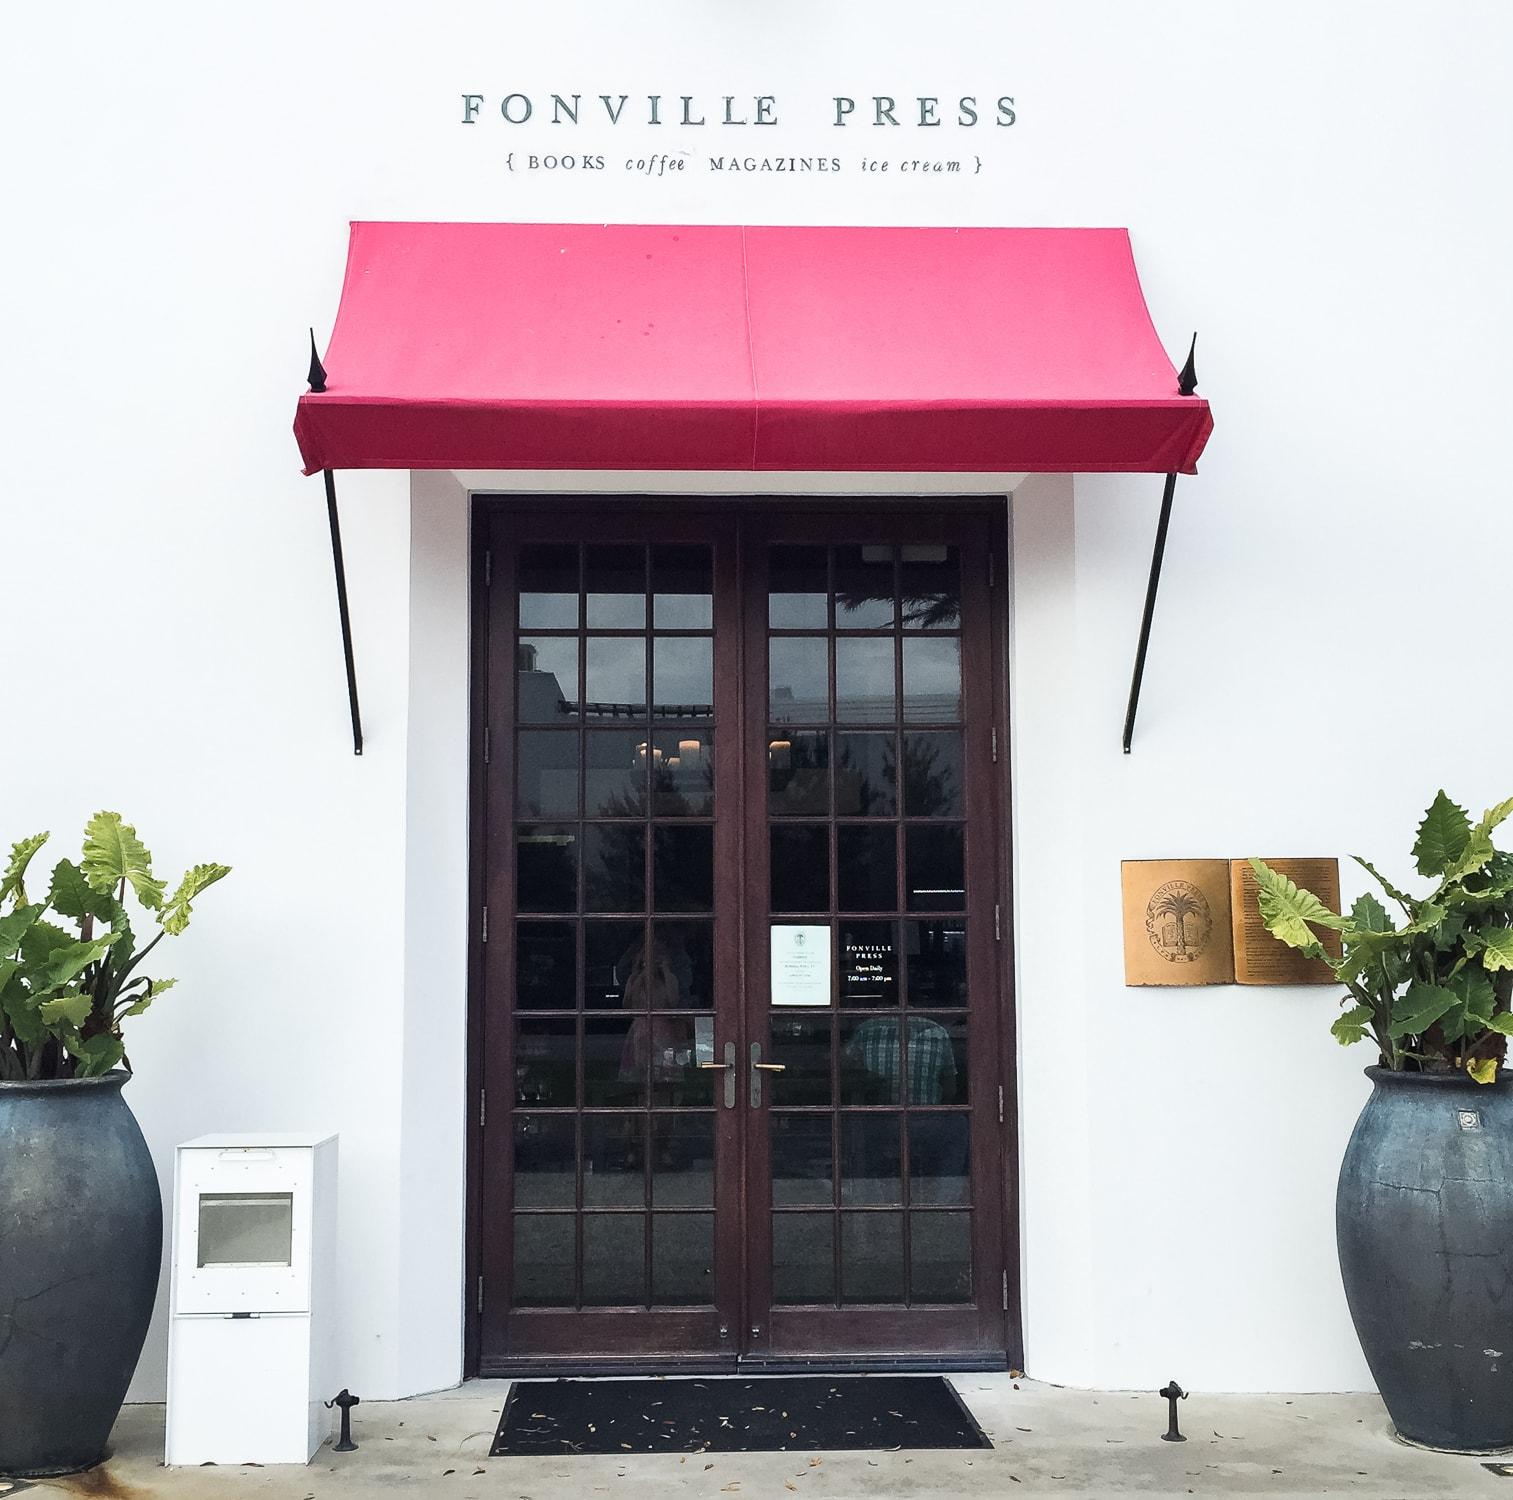 fonville-press-coffee-shop-alys-beach-florida-